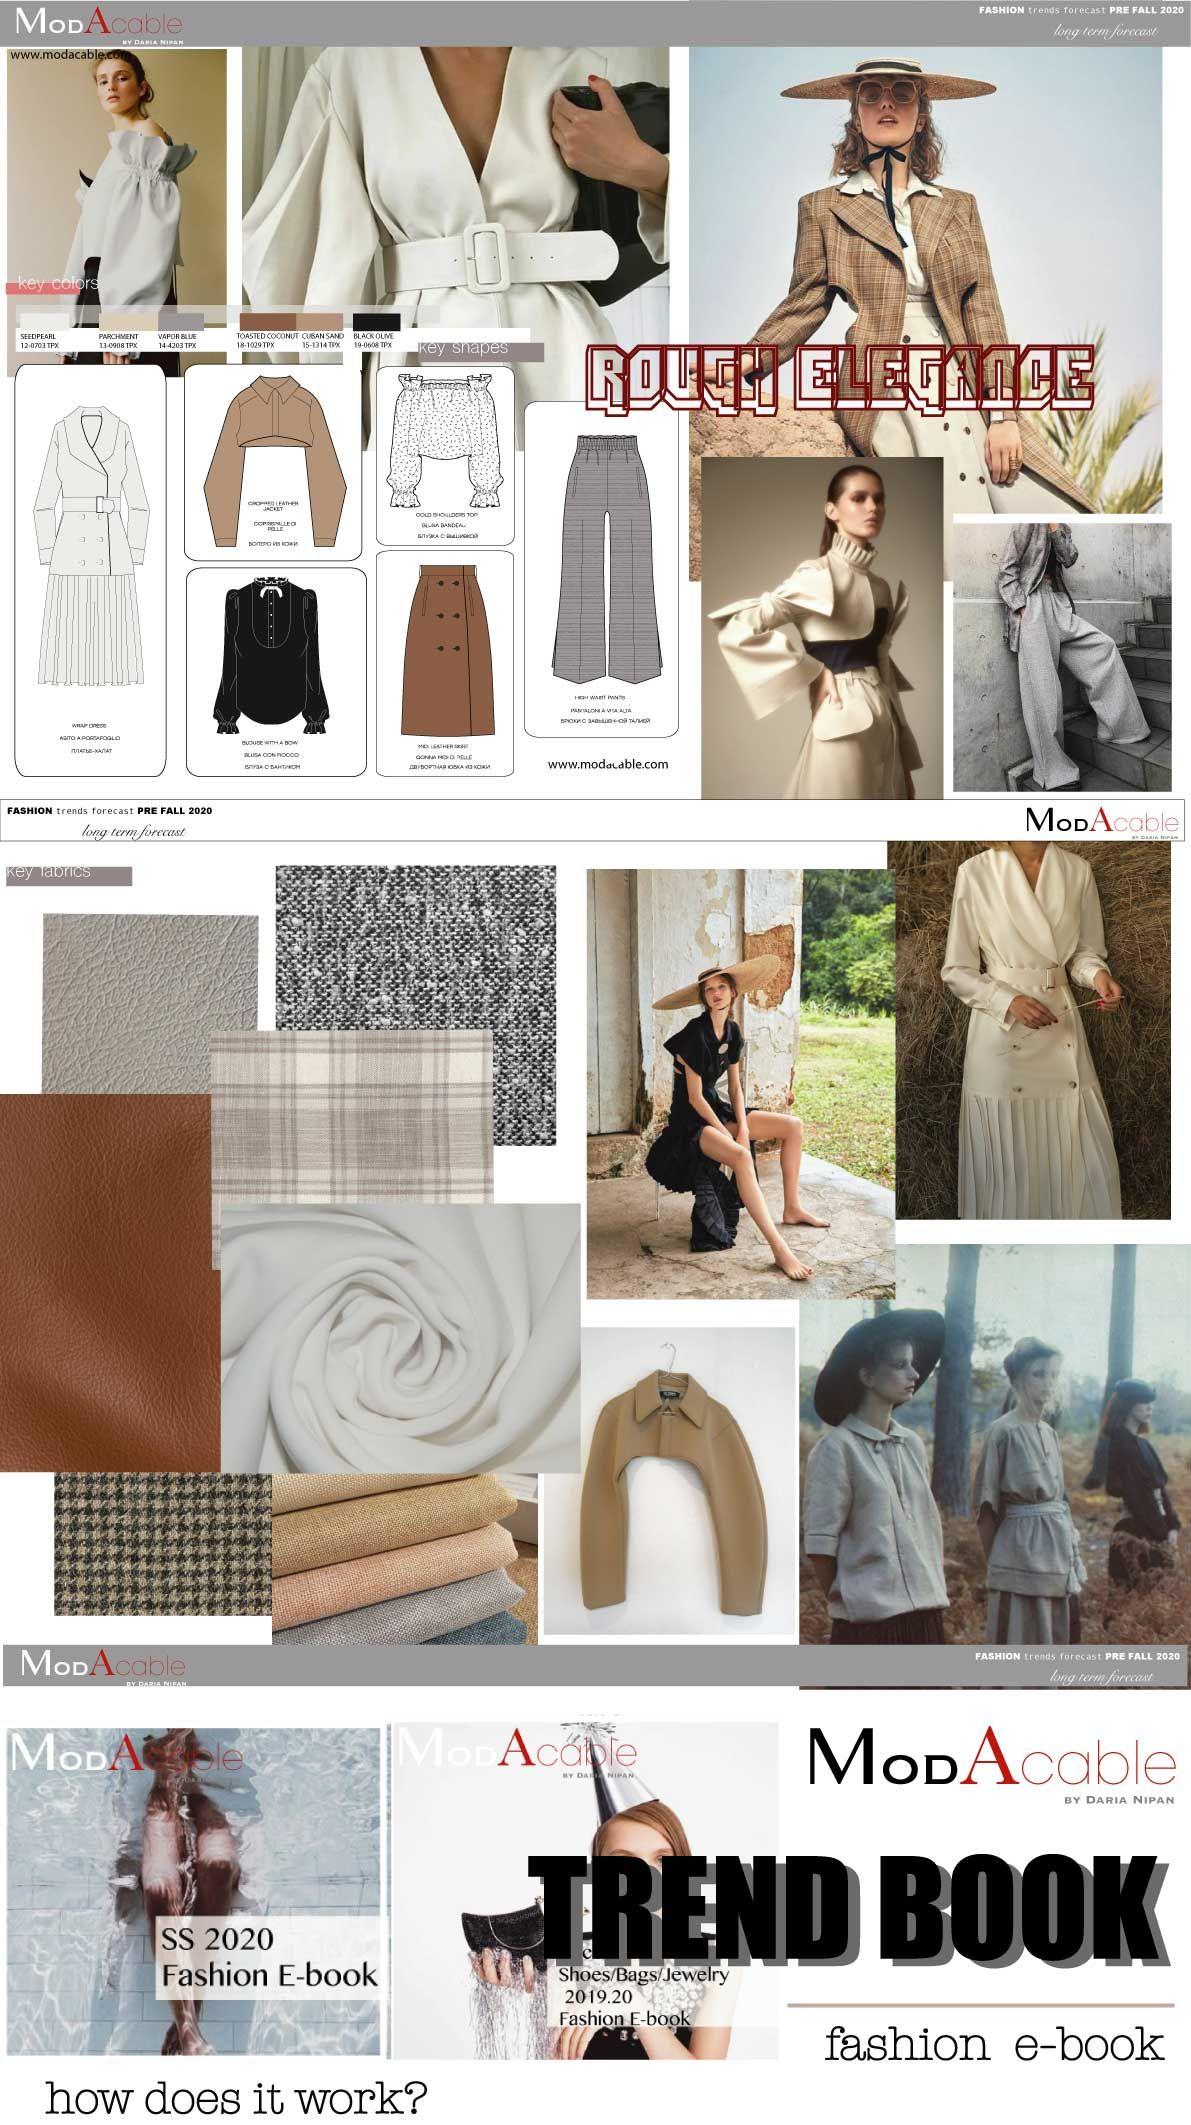 Trends Fall 2020.Pre Fall 2020 Fashion Trend Rough Elegance In 2019 2020